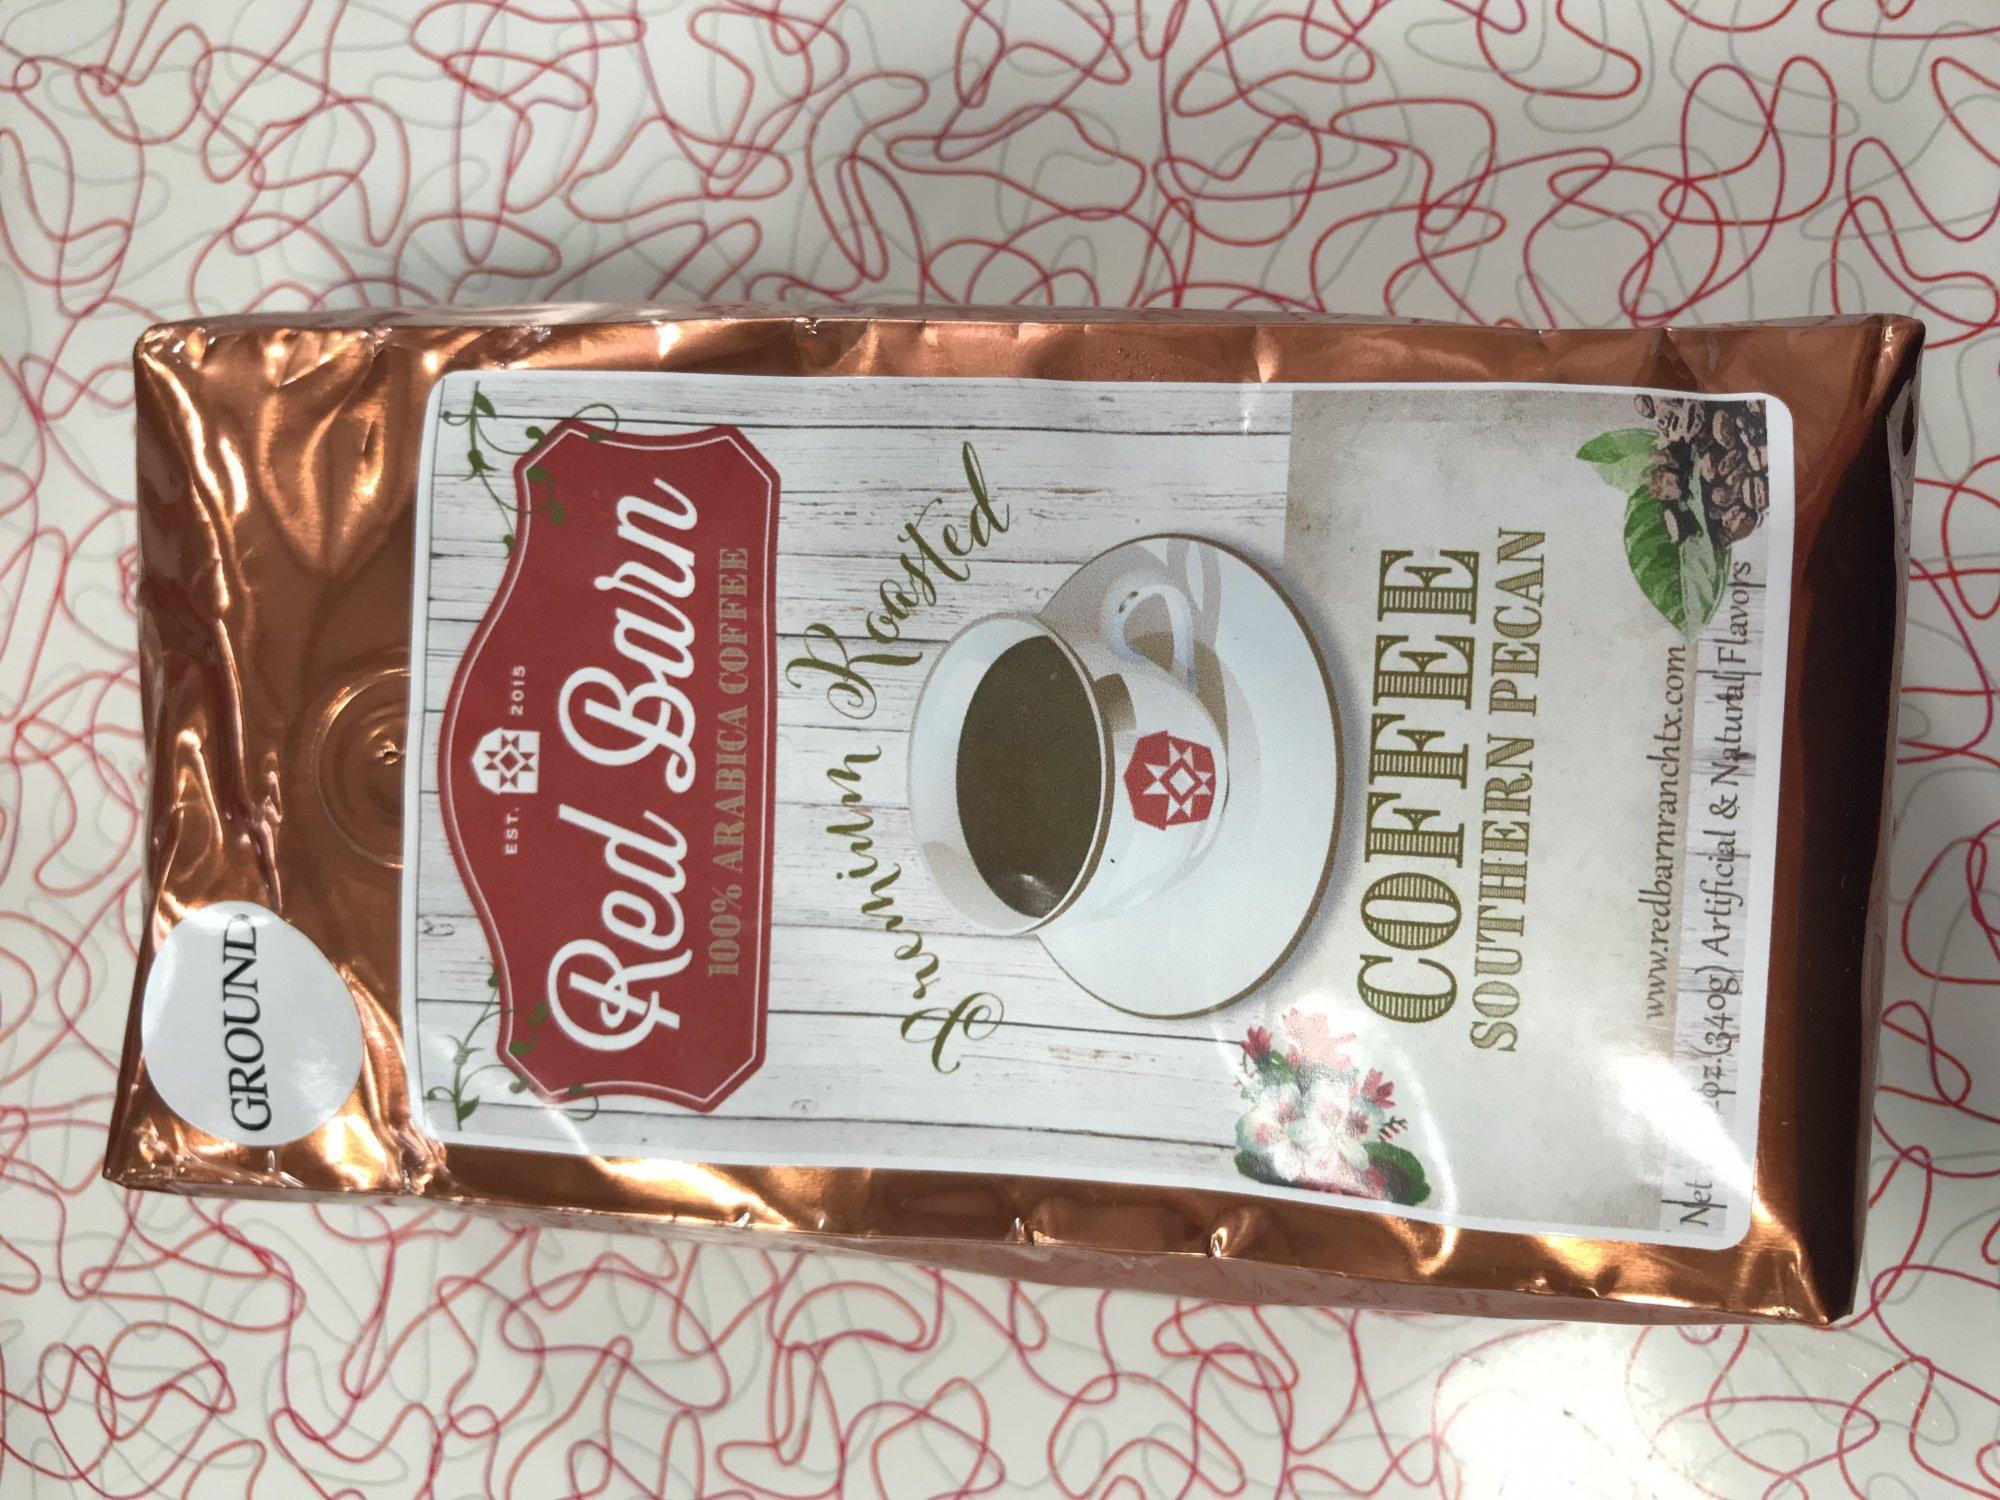 RB Coffee, French Vanilla 12 oz Bag